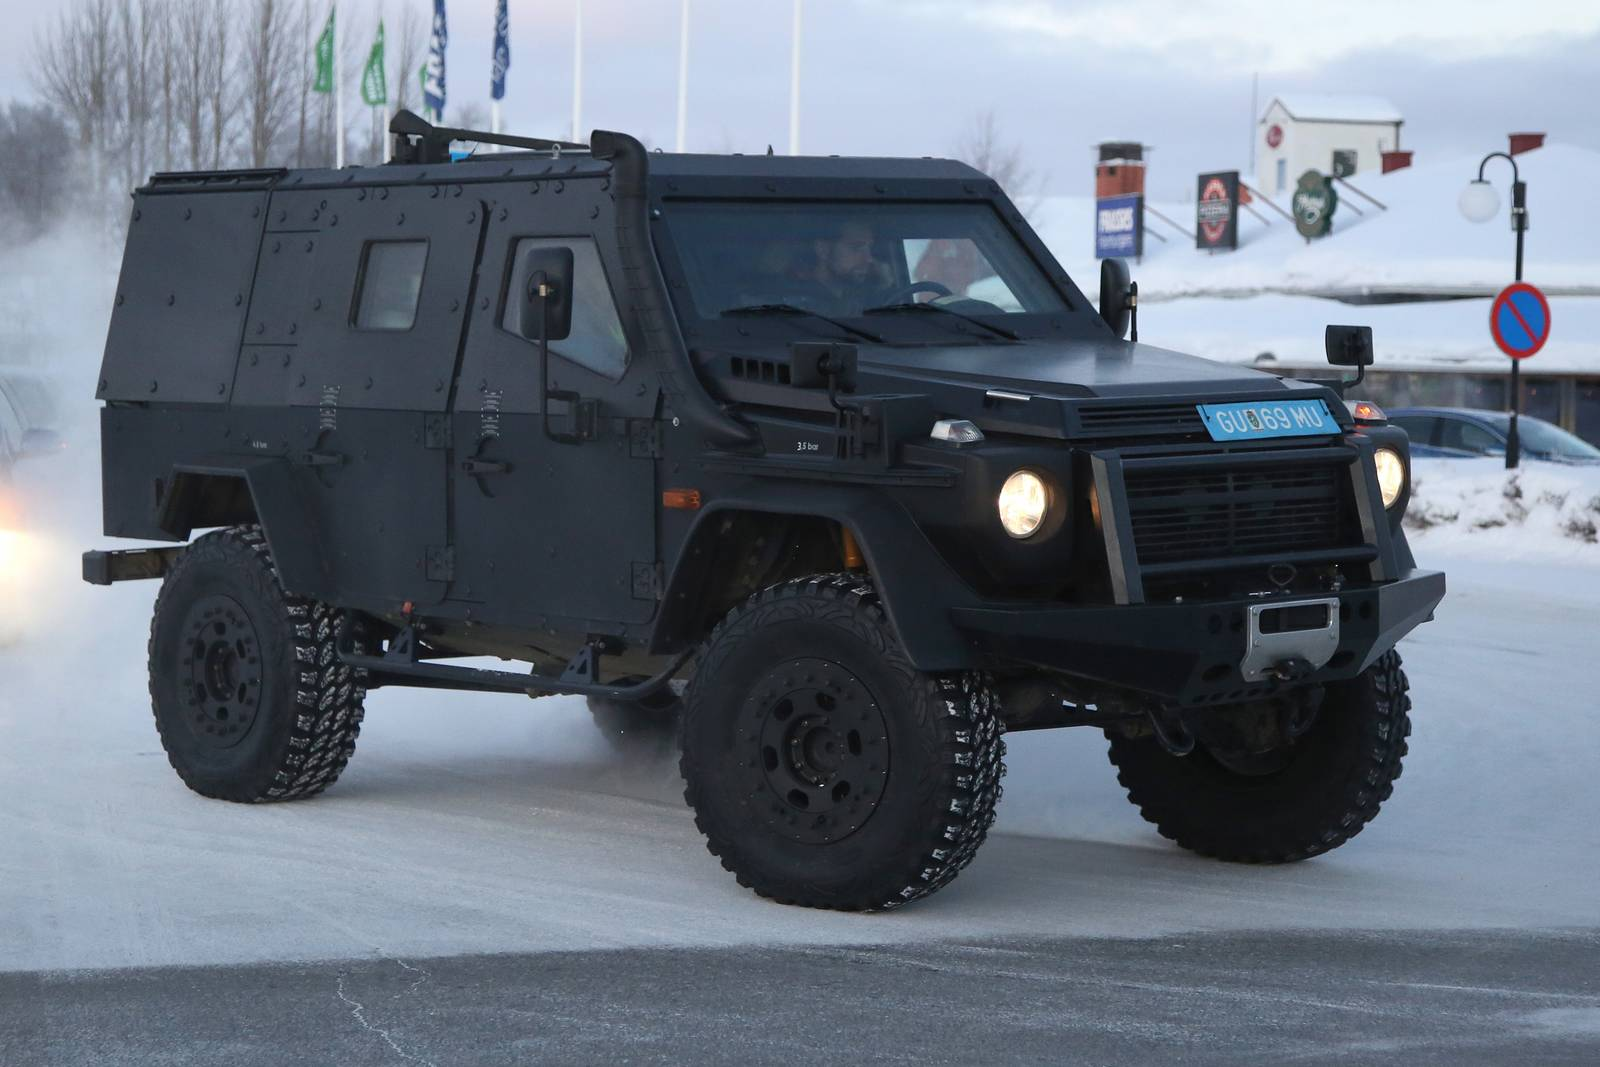 Mercedes benz g class lapv spy shots gtspirit for Mercedes benz vehicle